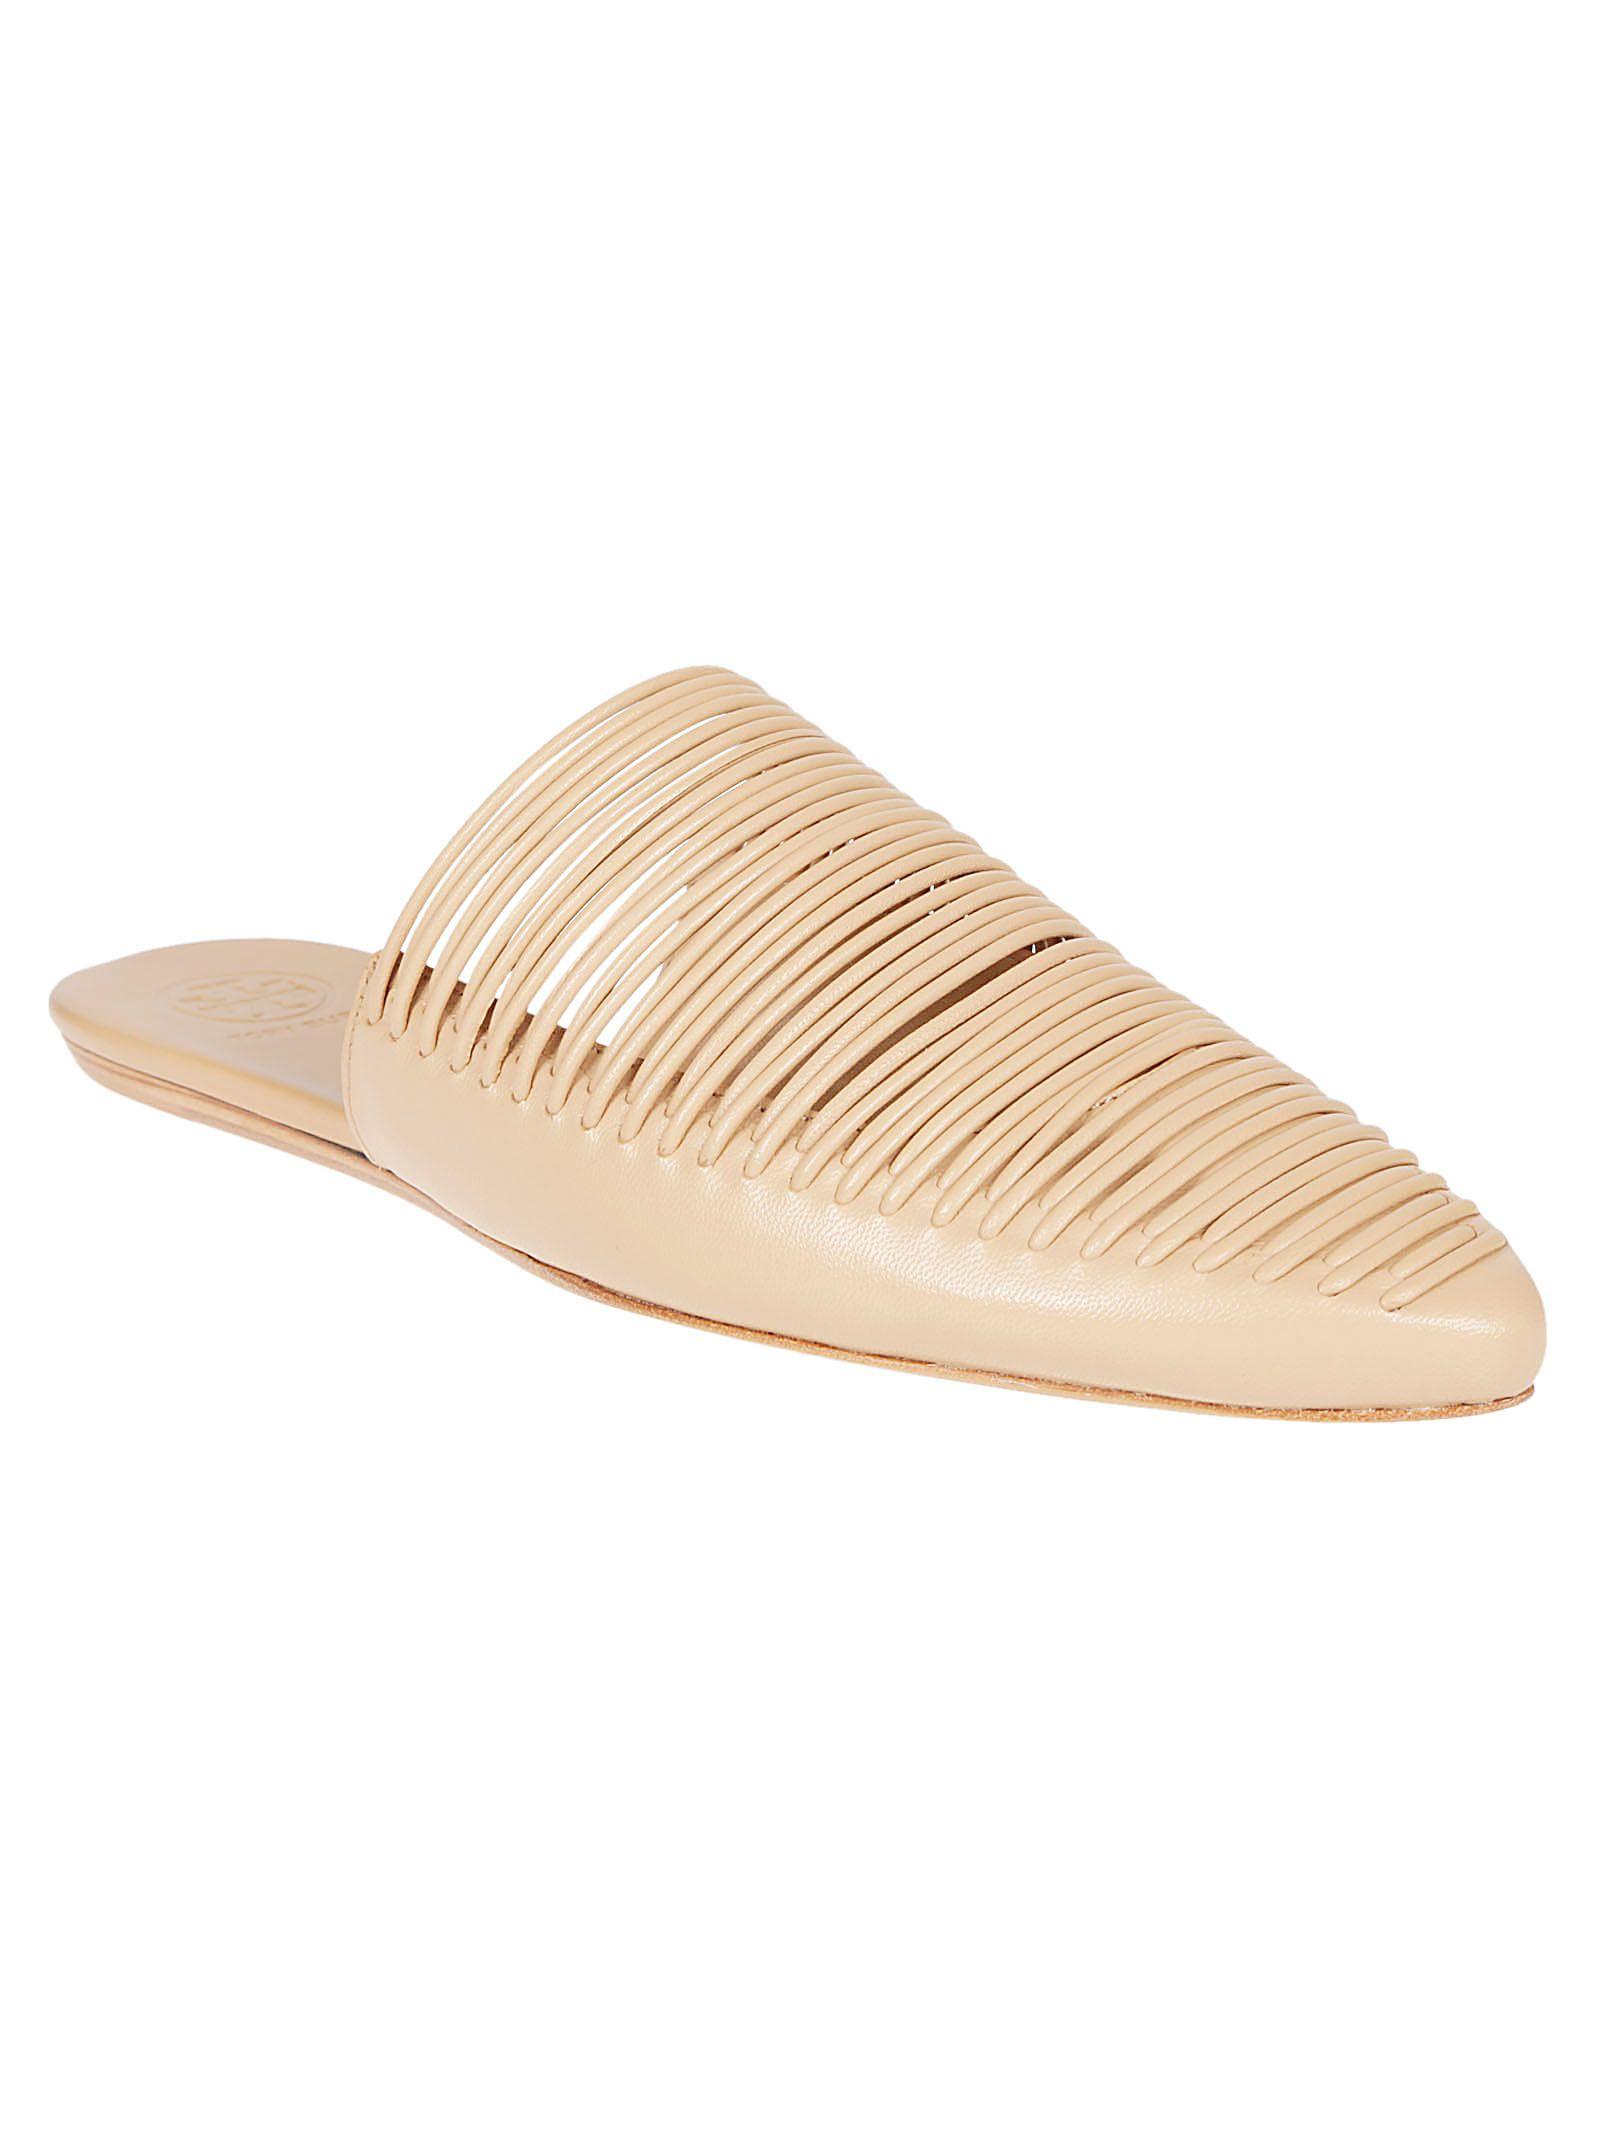 2304141ab623 Tory Burch Tory Burch Sienna Flat Sandals - Natural Vachetta ...